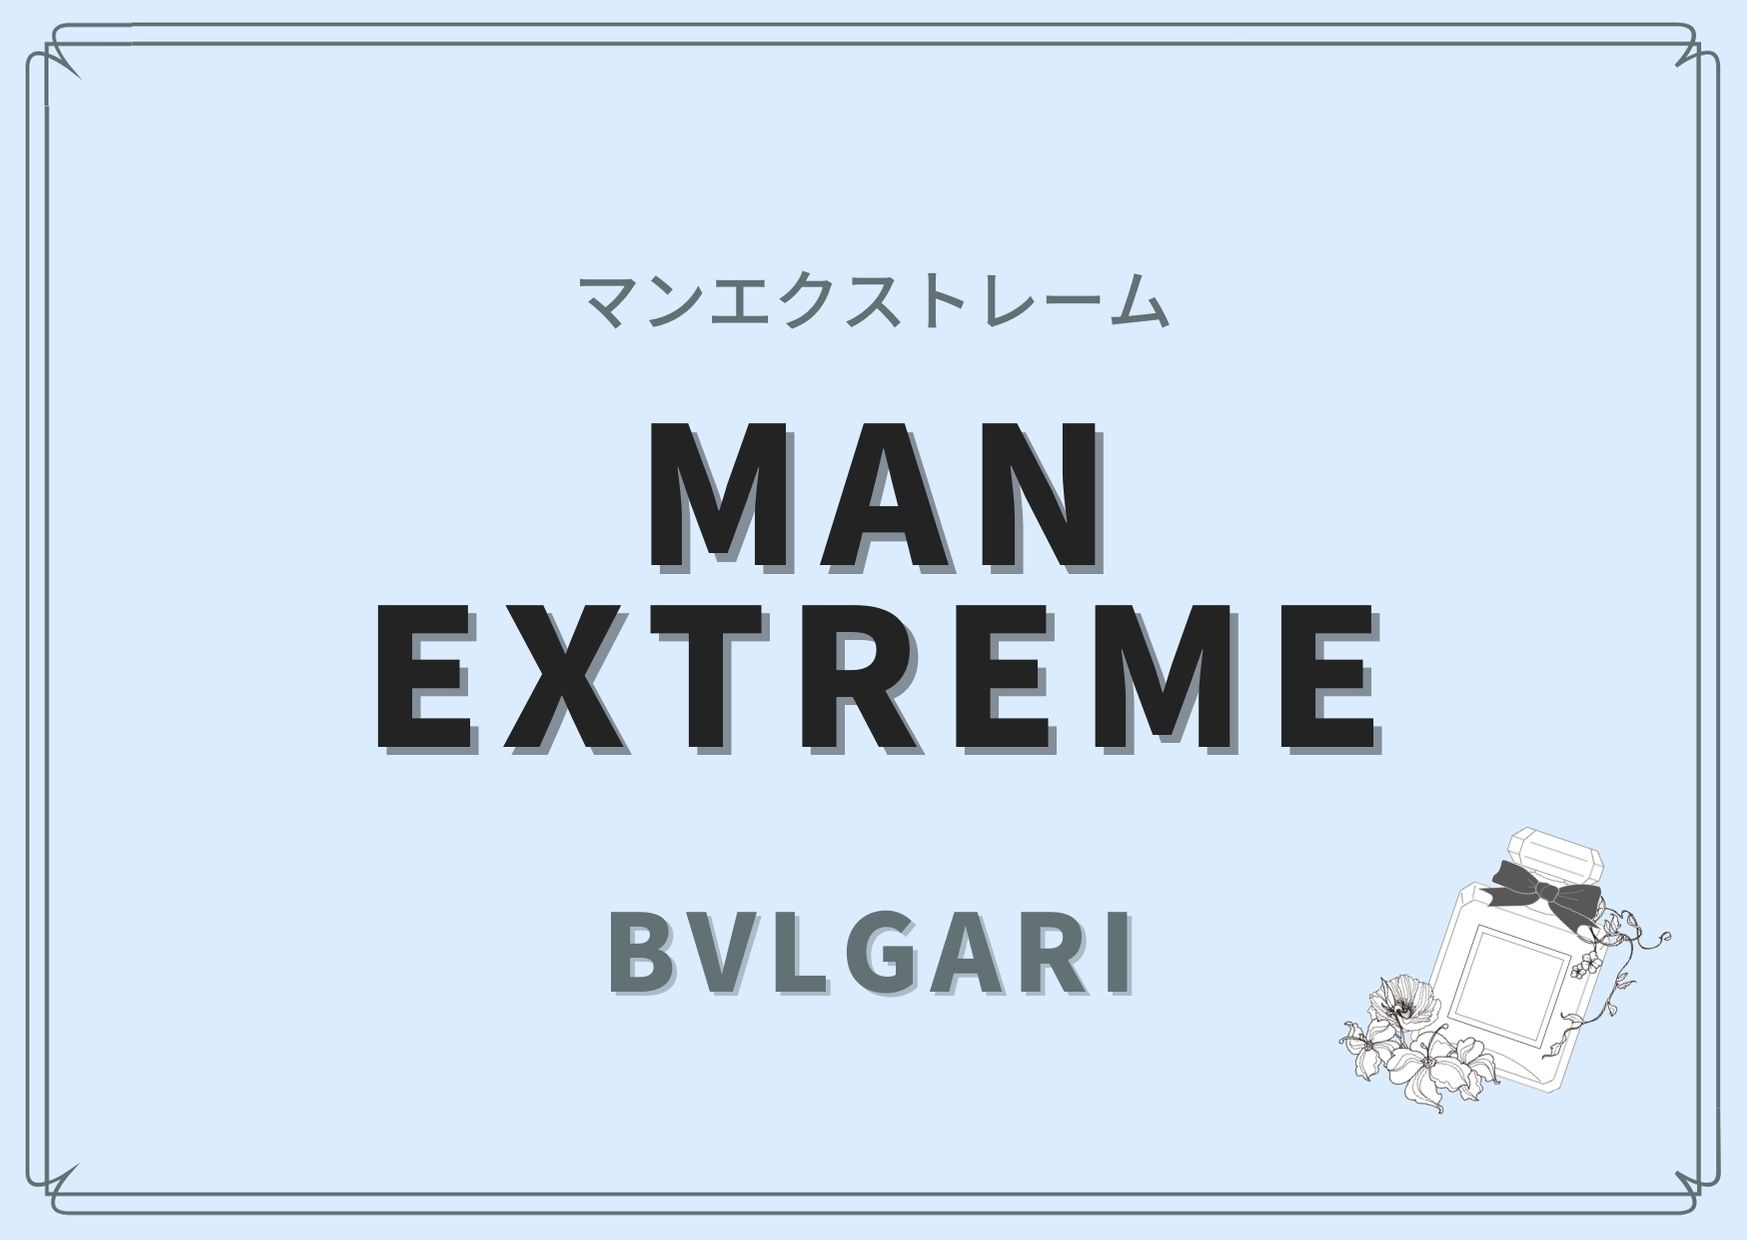 Man Extreme(マンエクストレーム )/ BVLGARI(ブルガリ)